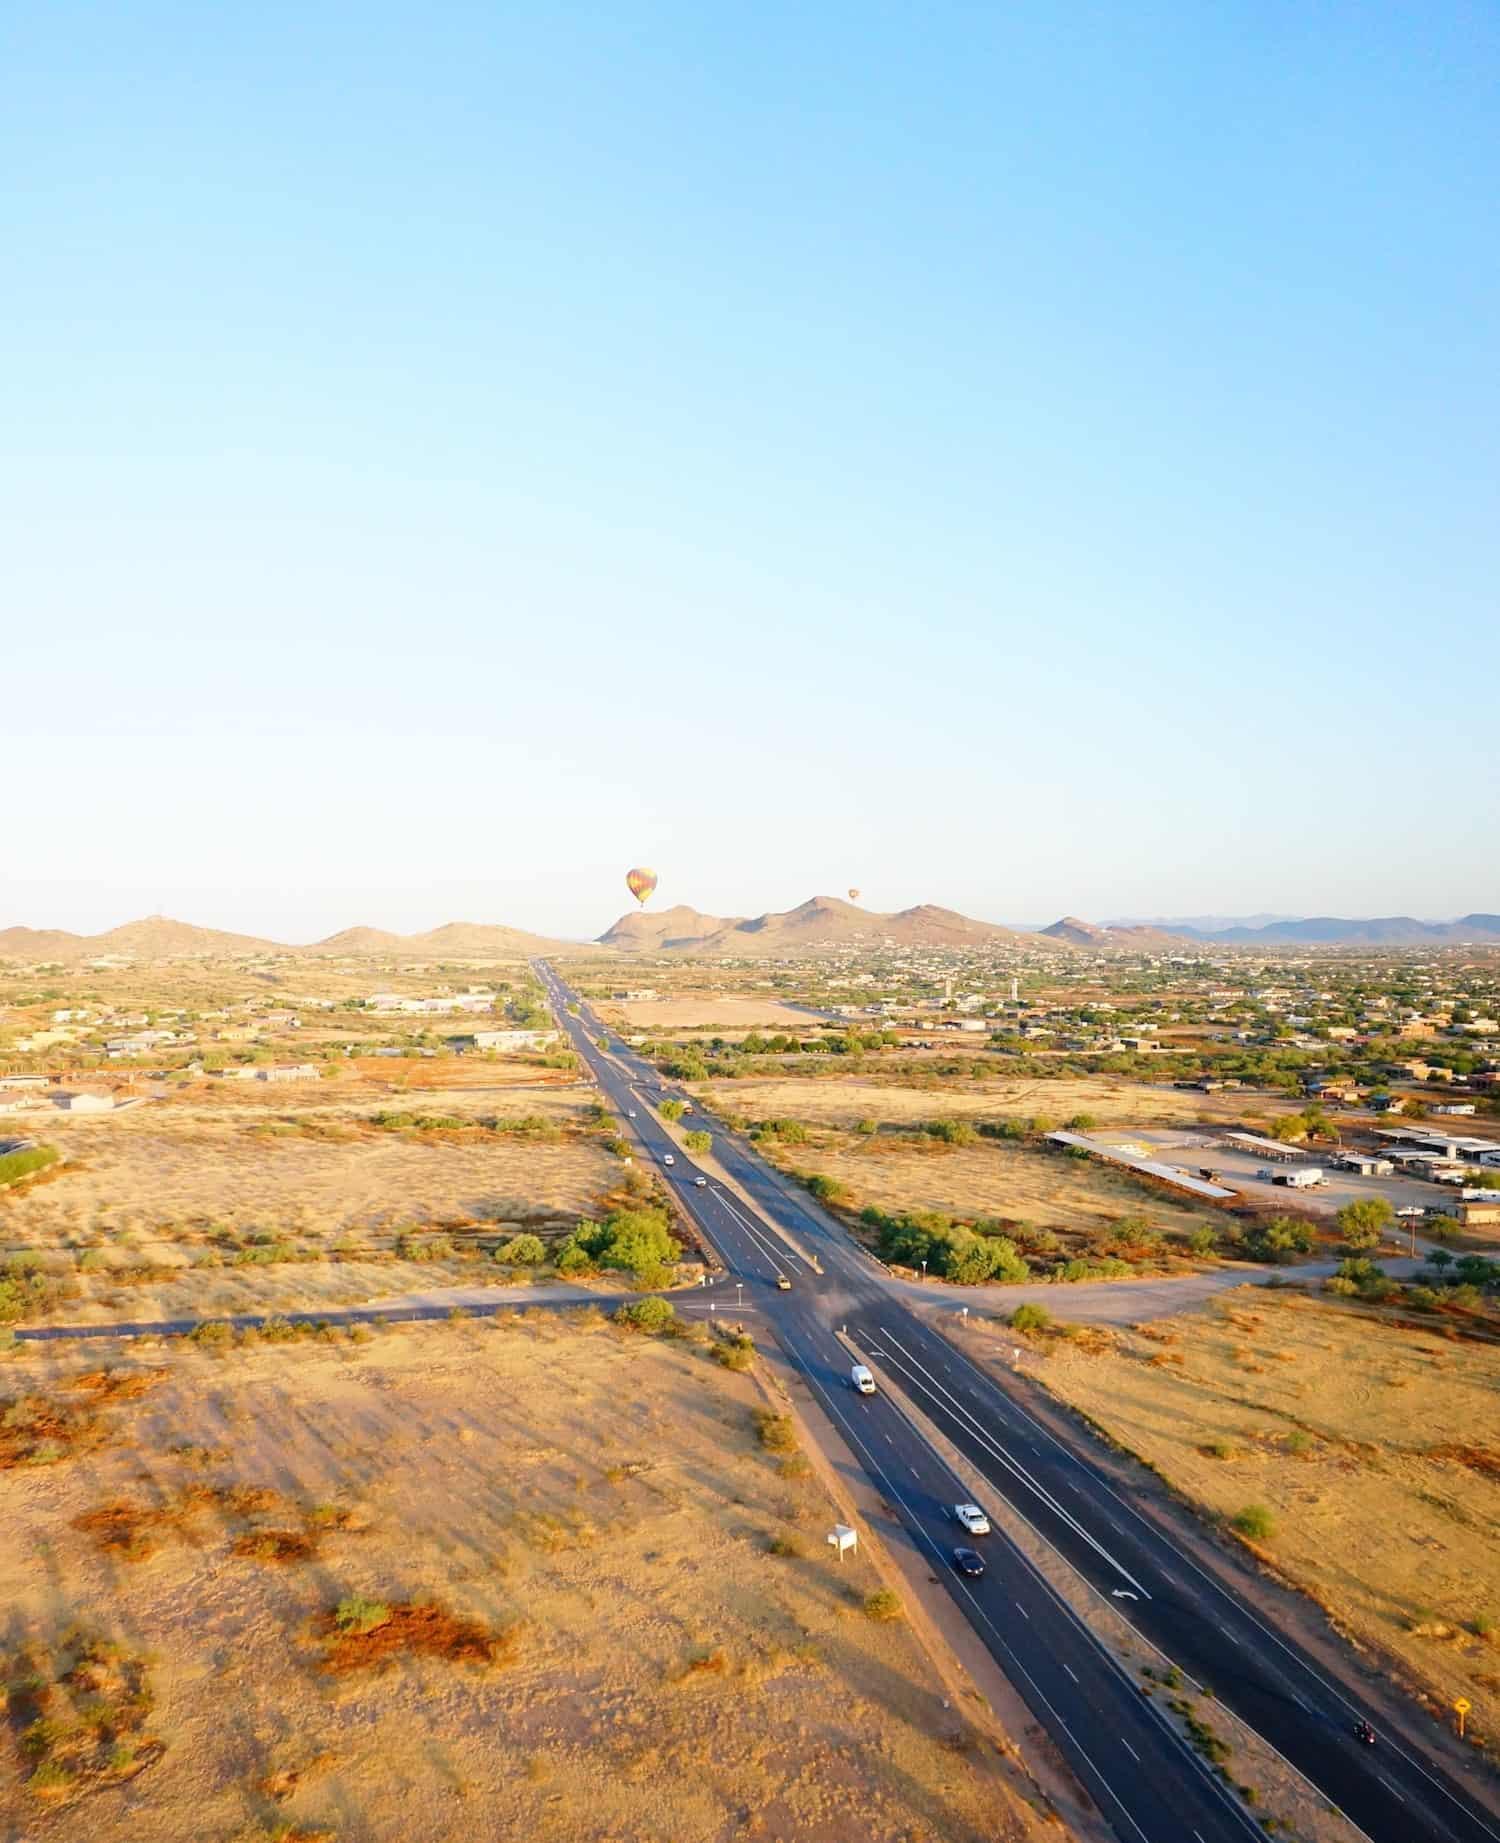 Scottsdale - Hot Air Balloon